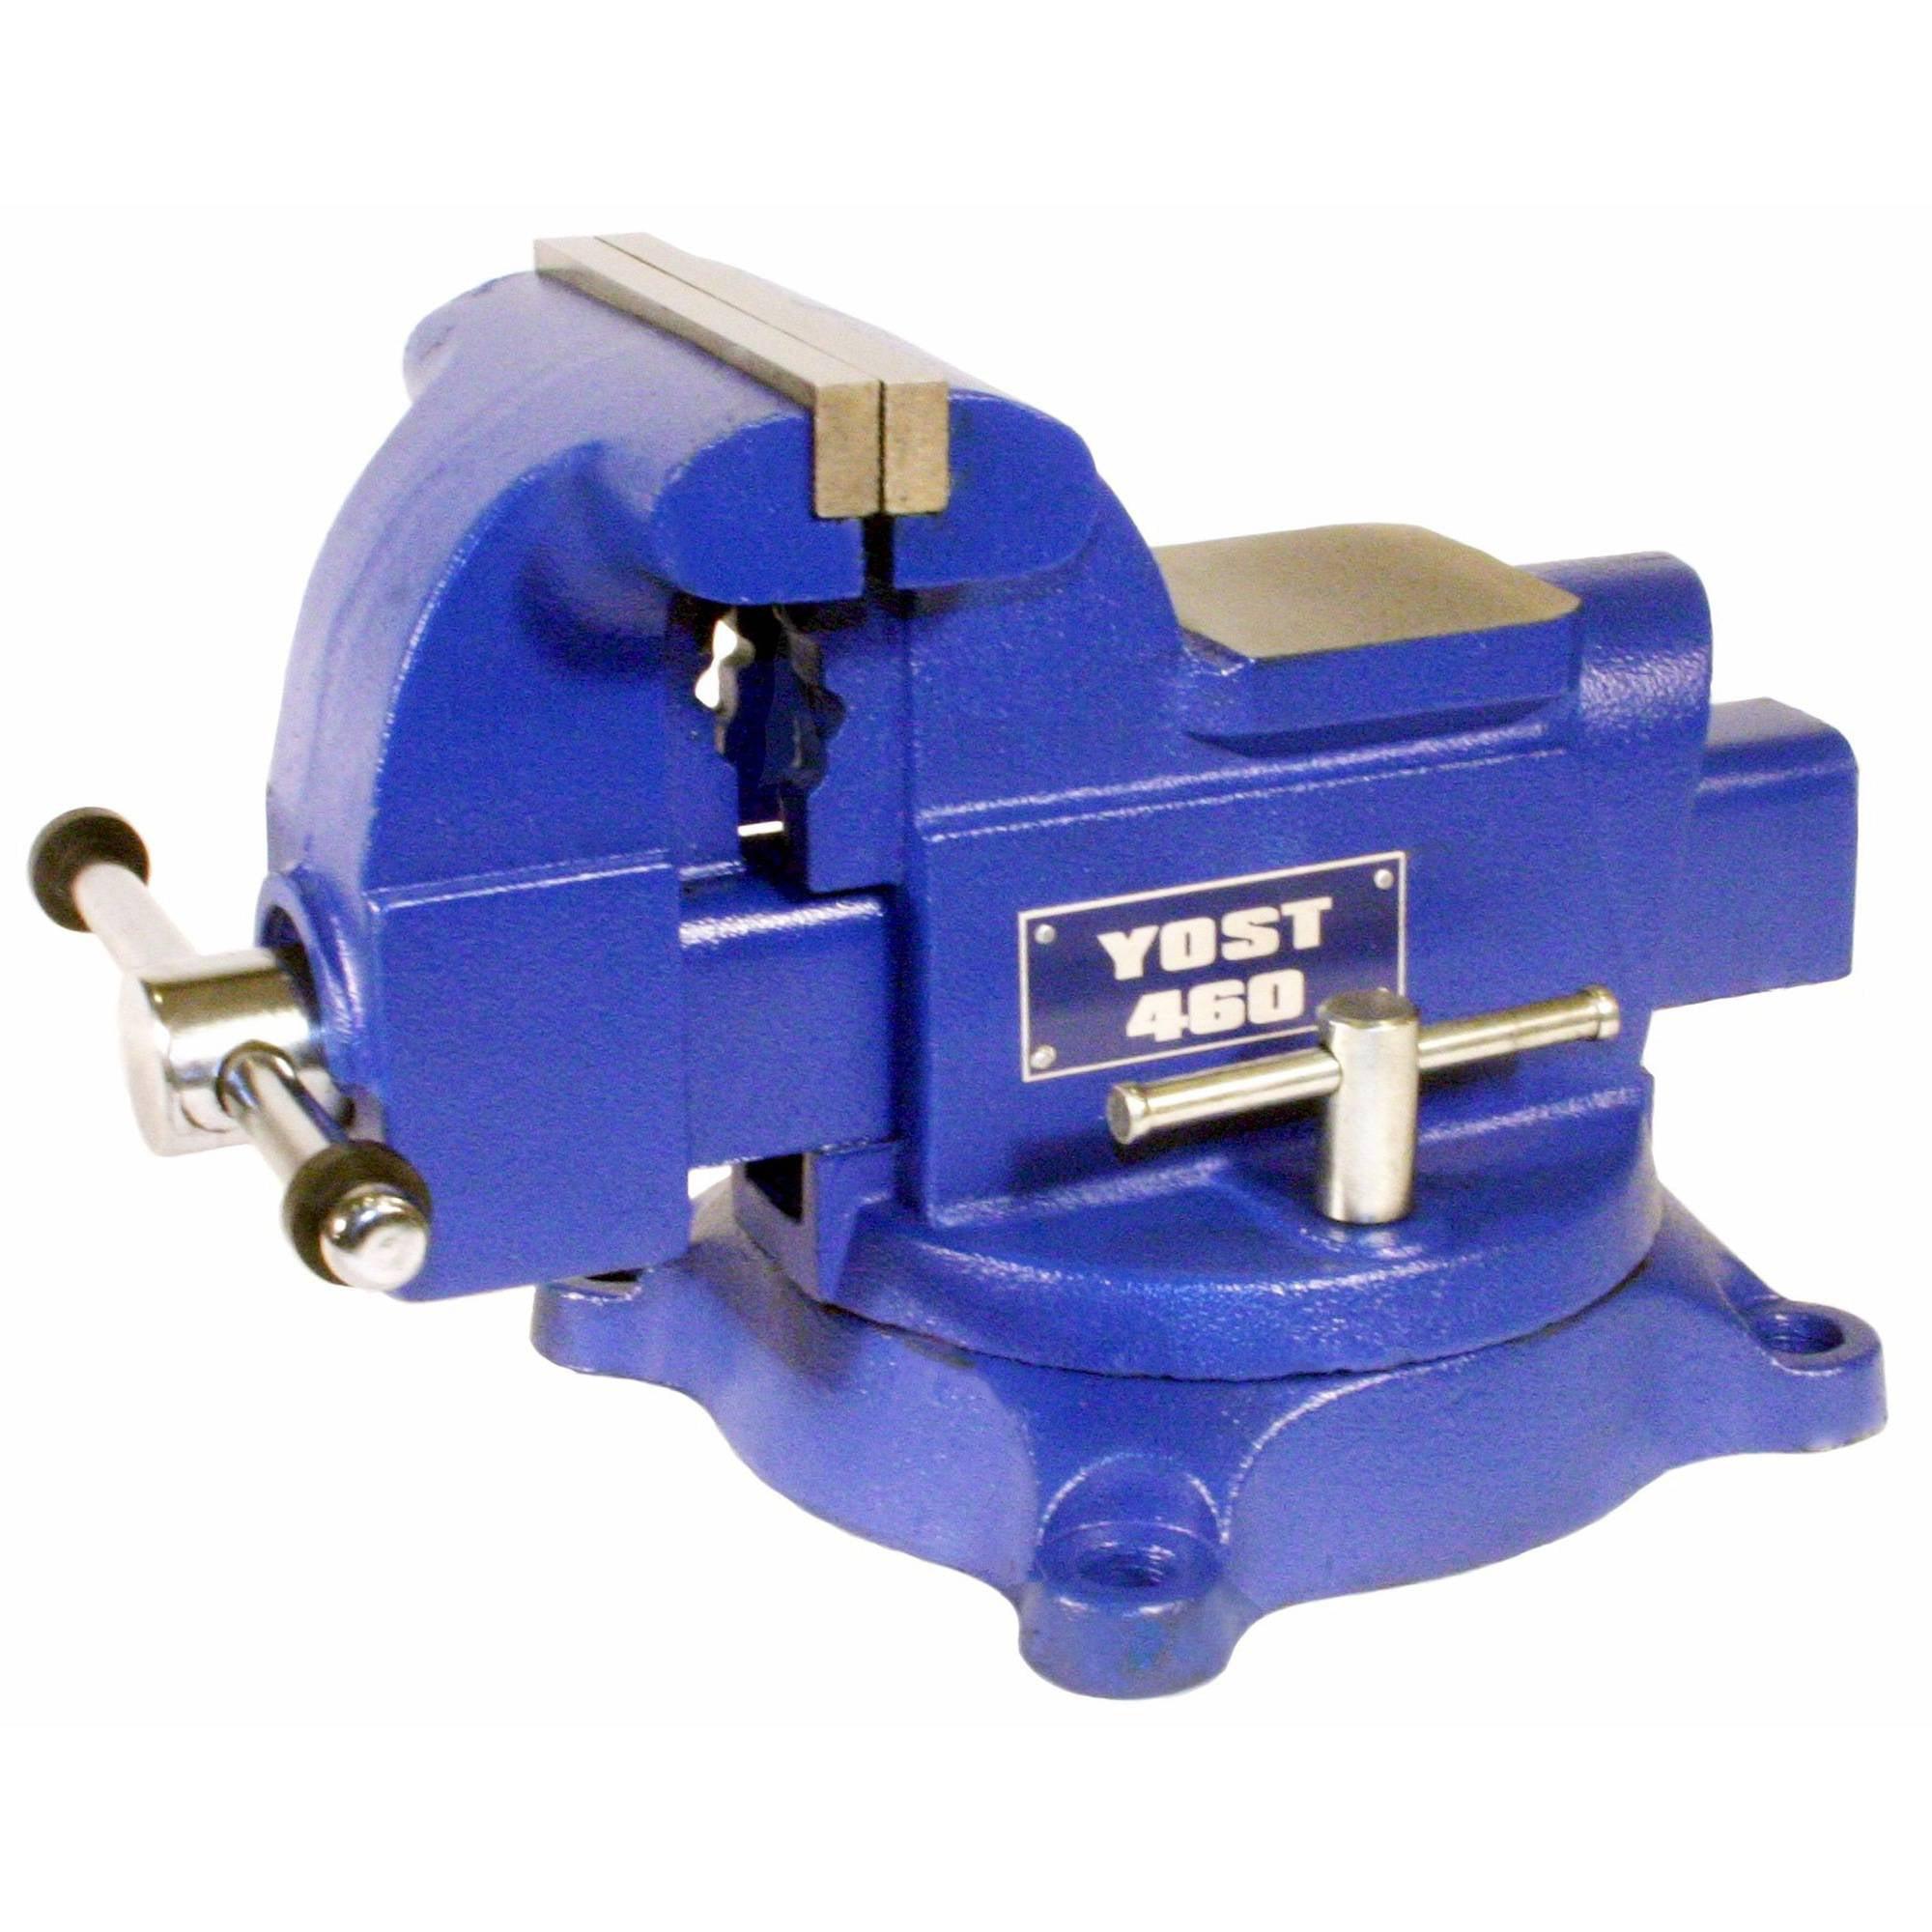 "Yost 6"" Utility Vise, Model 460 Apprentice Series Bench Vise by Yost Vises"